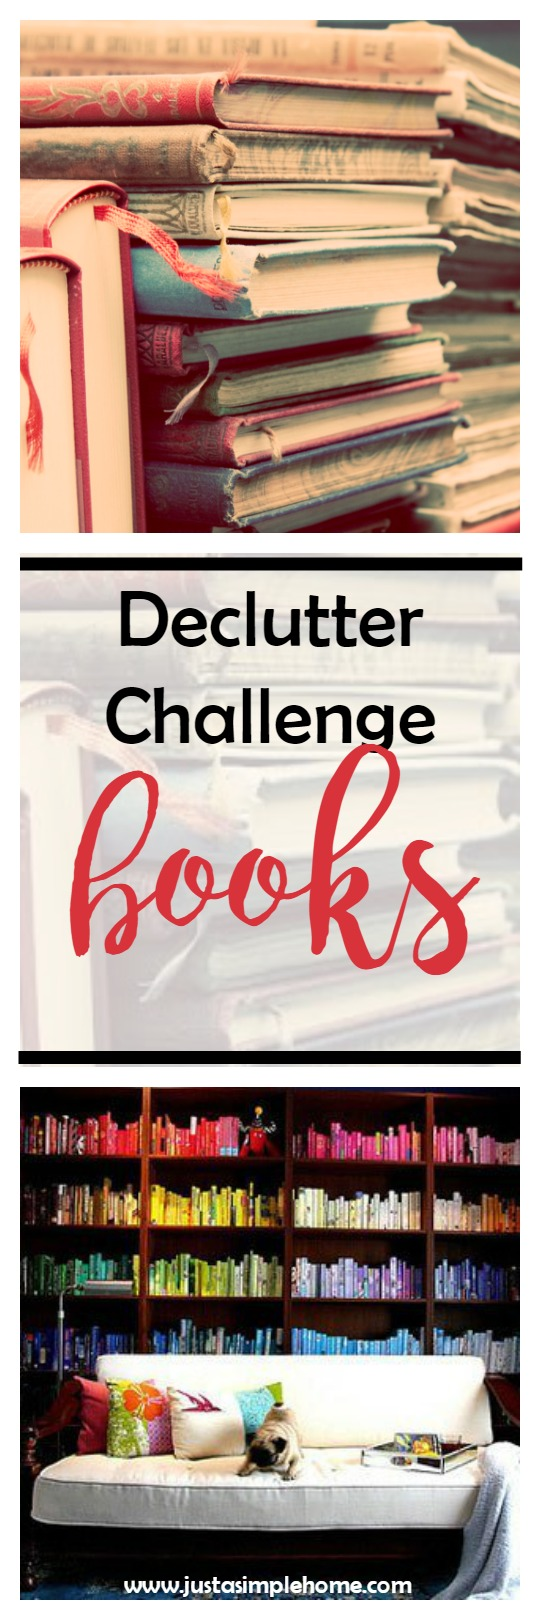 declutter challenge - books